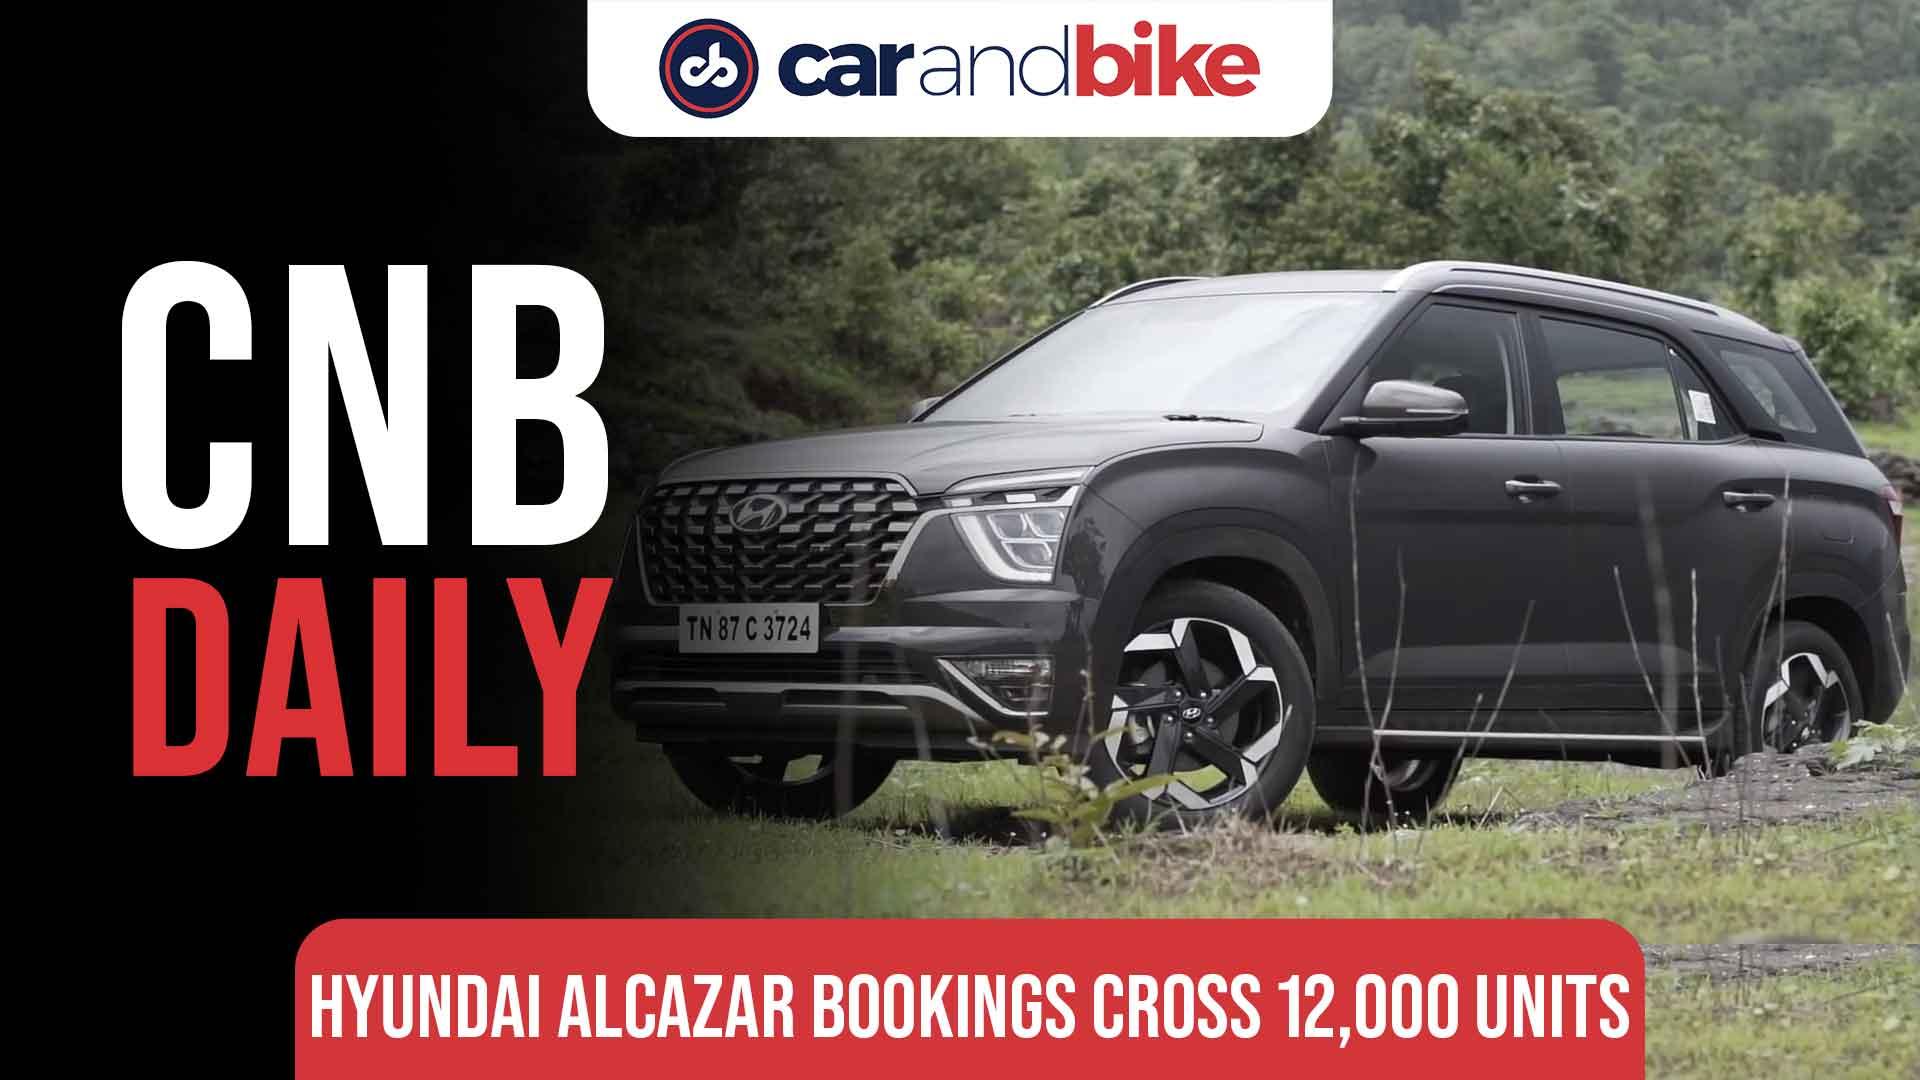 Hyundai Alcazar Bookings Cross 12,000 Mark